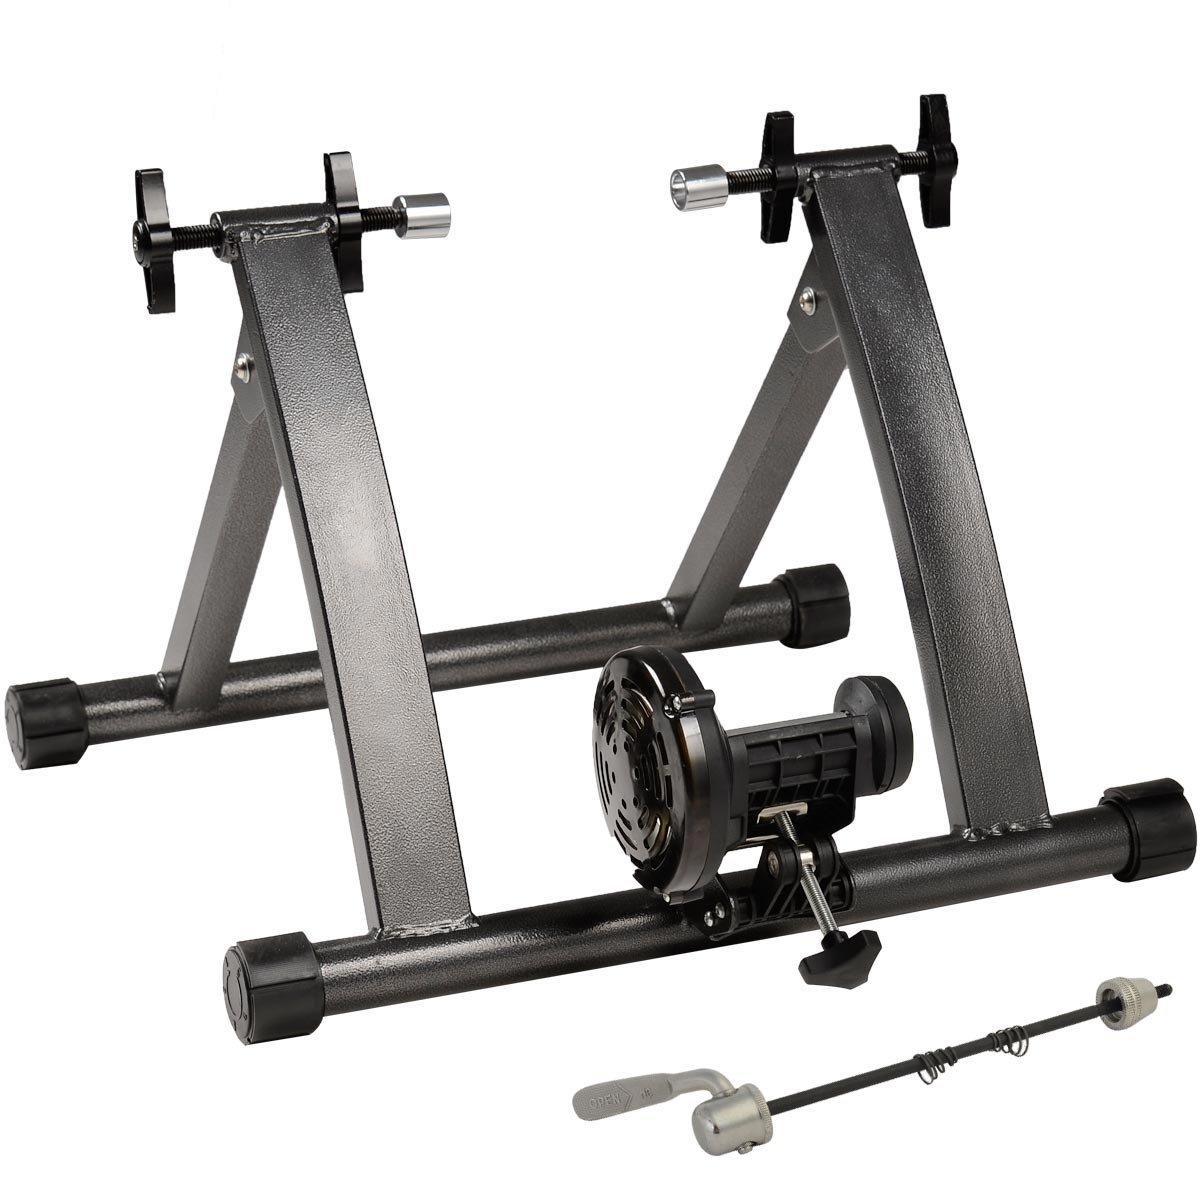 Goplus Bike Trainer Magnet Steel Indoor Bicycle Exercise Stand